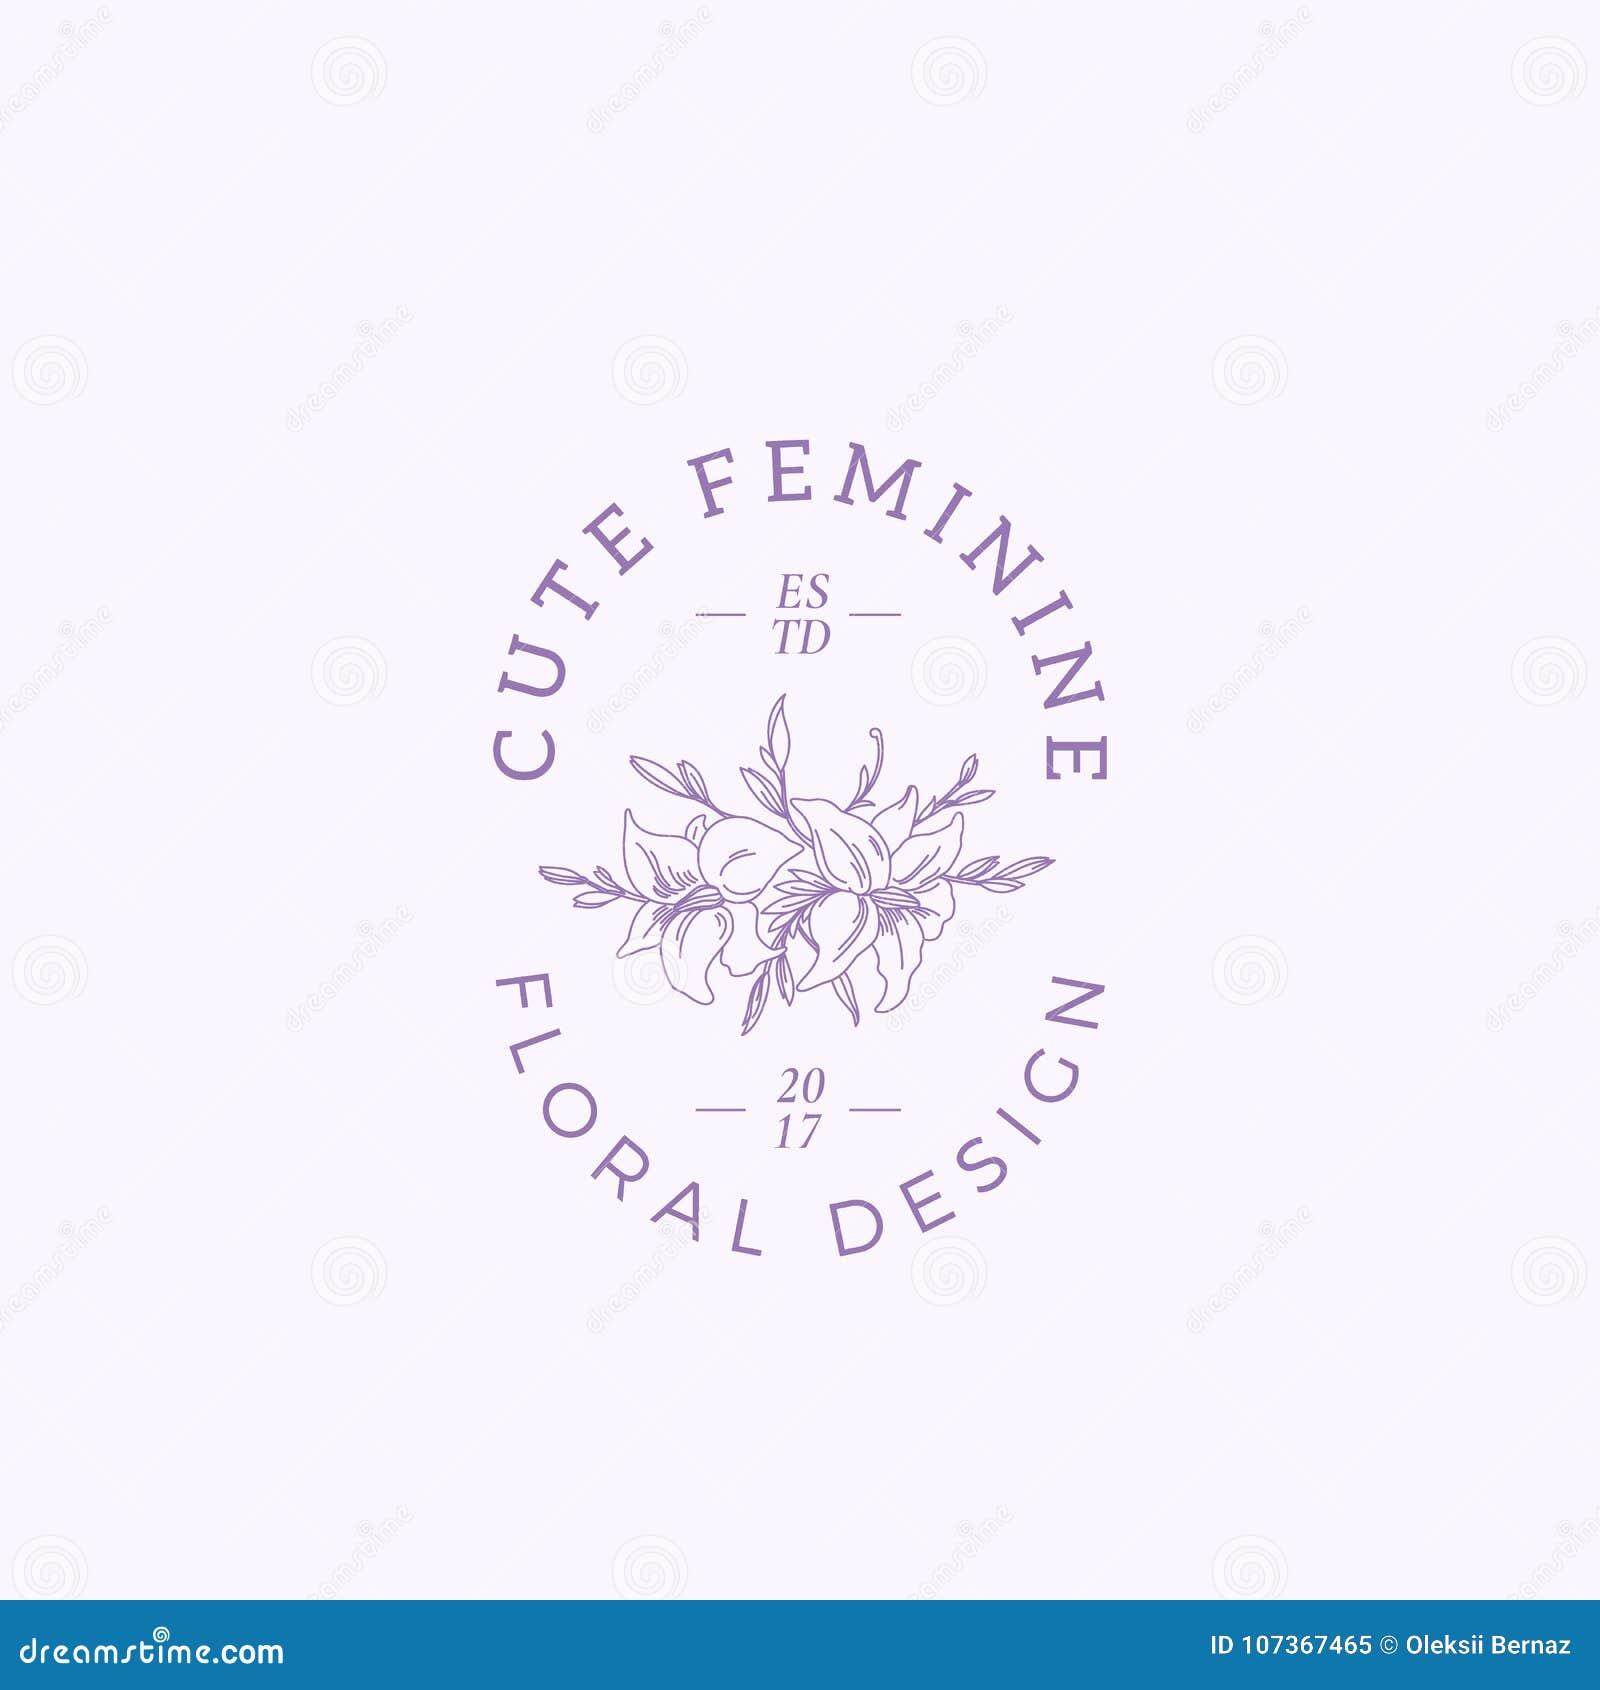 Feminine Logo Collections Template: Cute Feminine Vector Sign, Symbol Or Logo Template